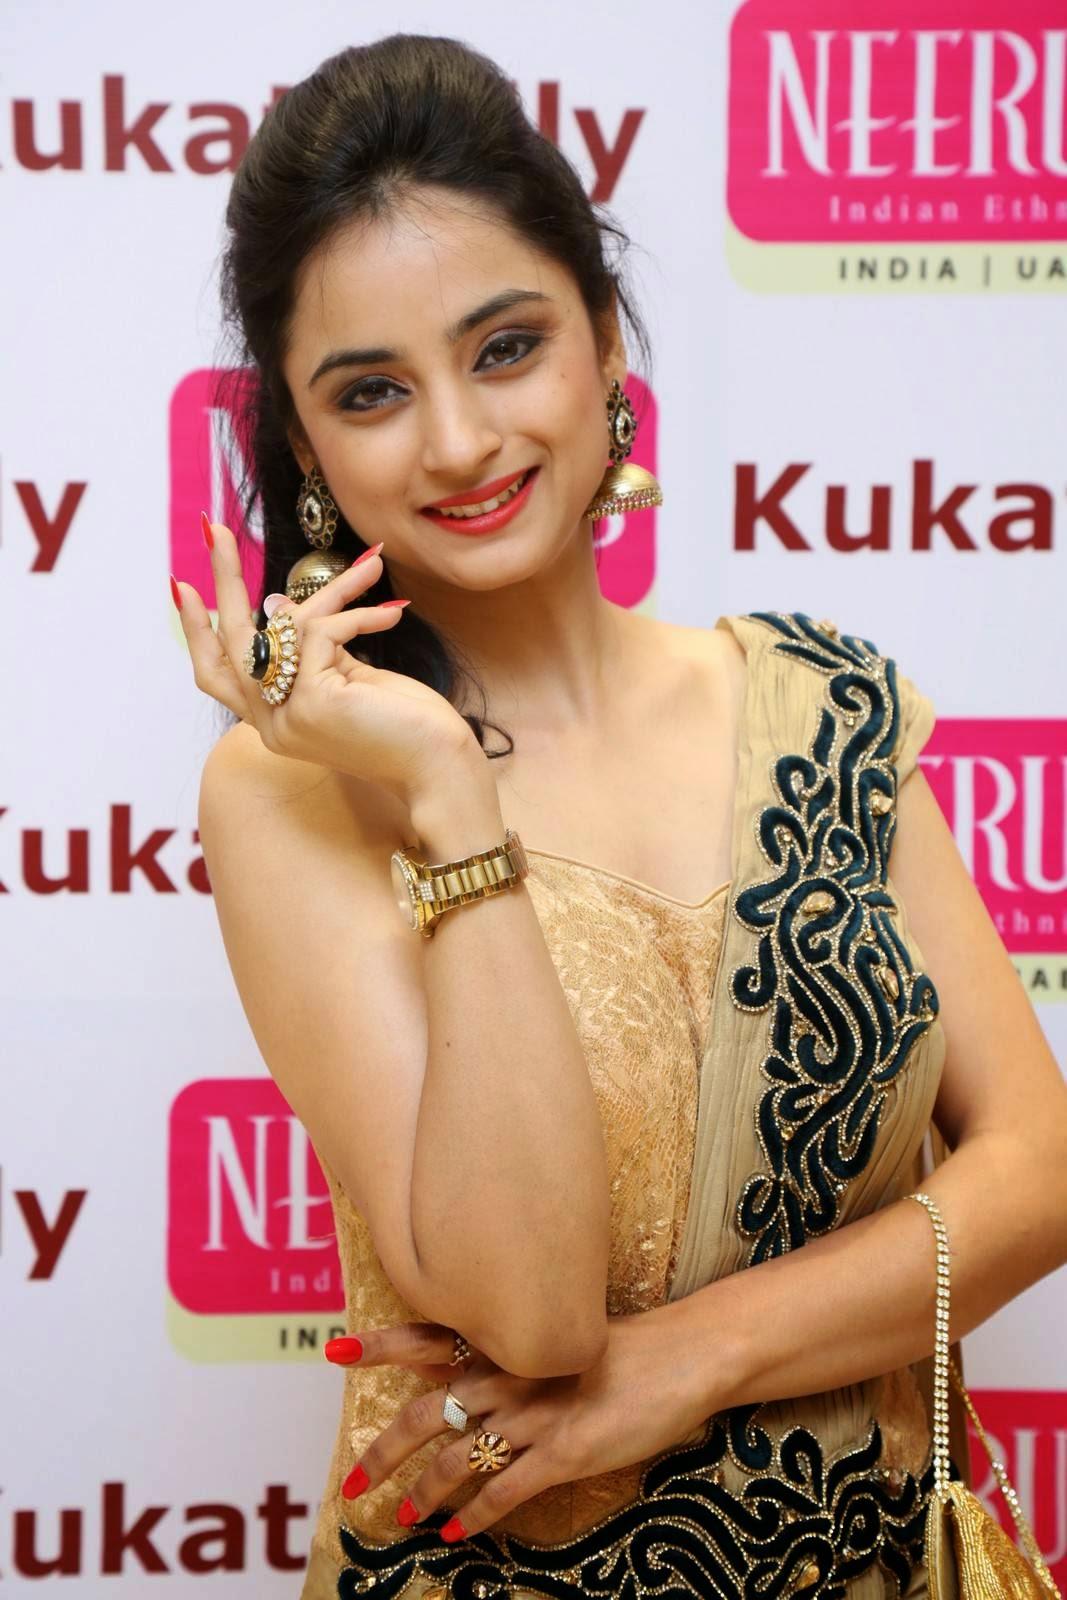 Madirakshi Stills At Neerus Show Room Launch Indian